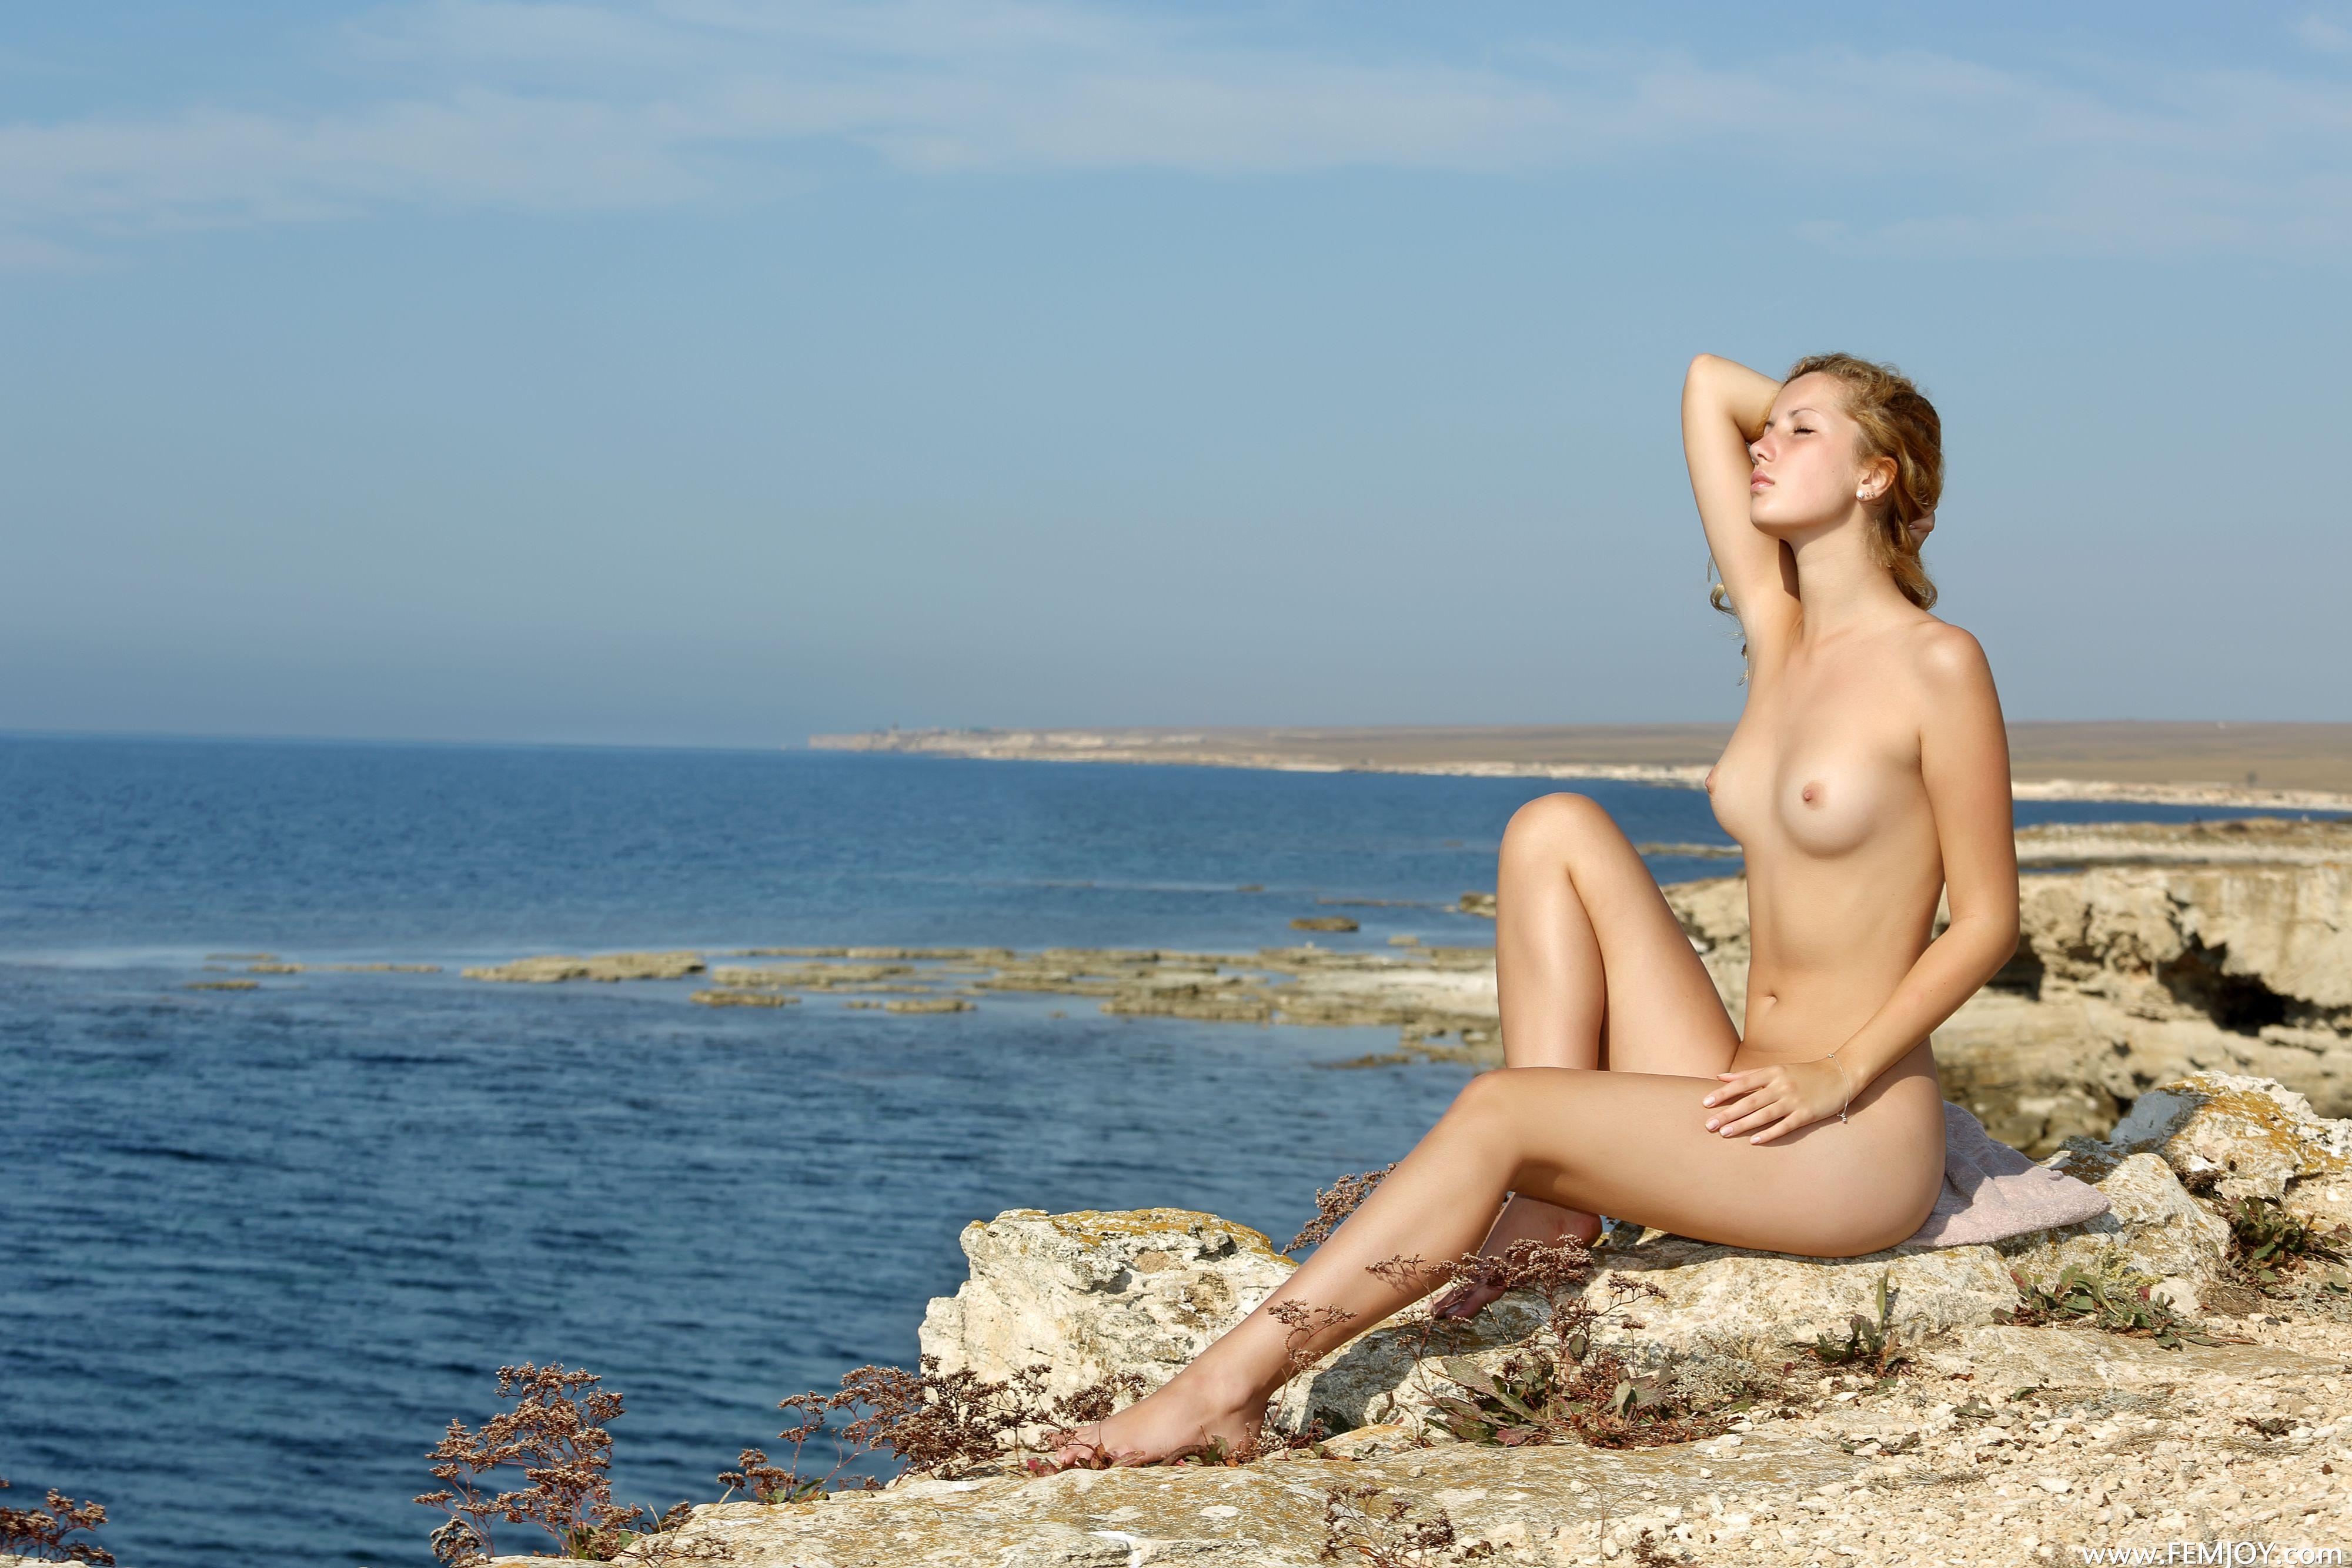 http://i5.imageban.ru/out/2013/08/14/80aed782c5b1551f3bd3af9c91f64d90.jpg